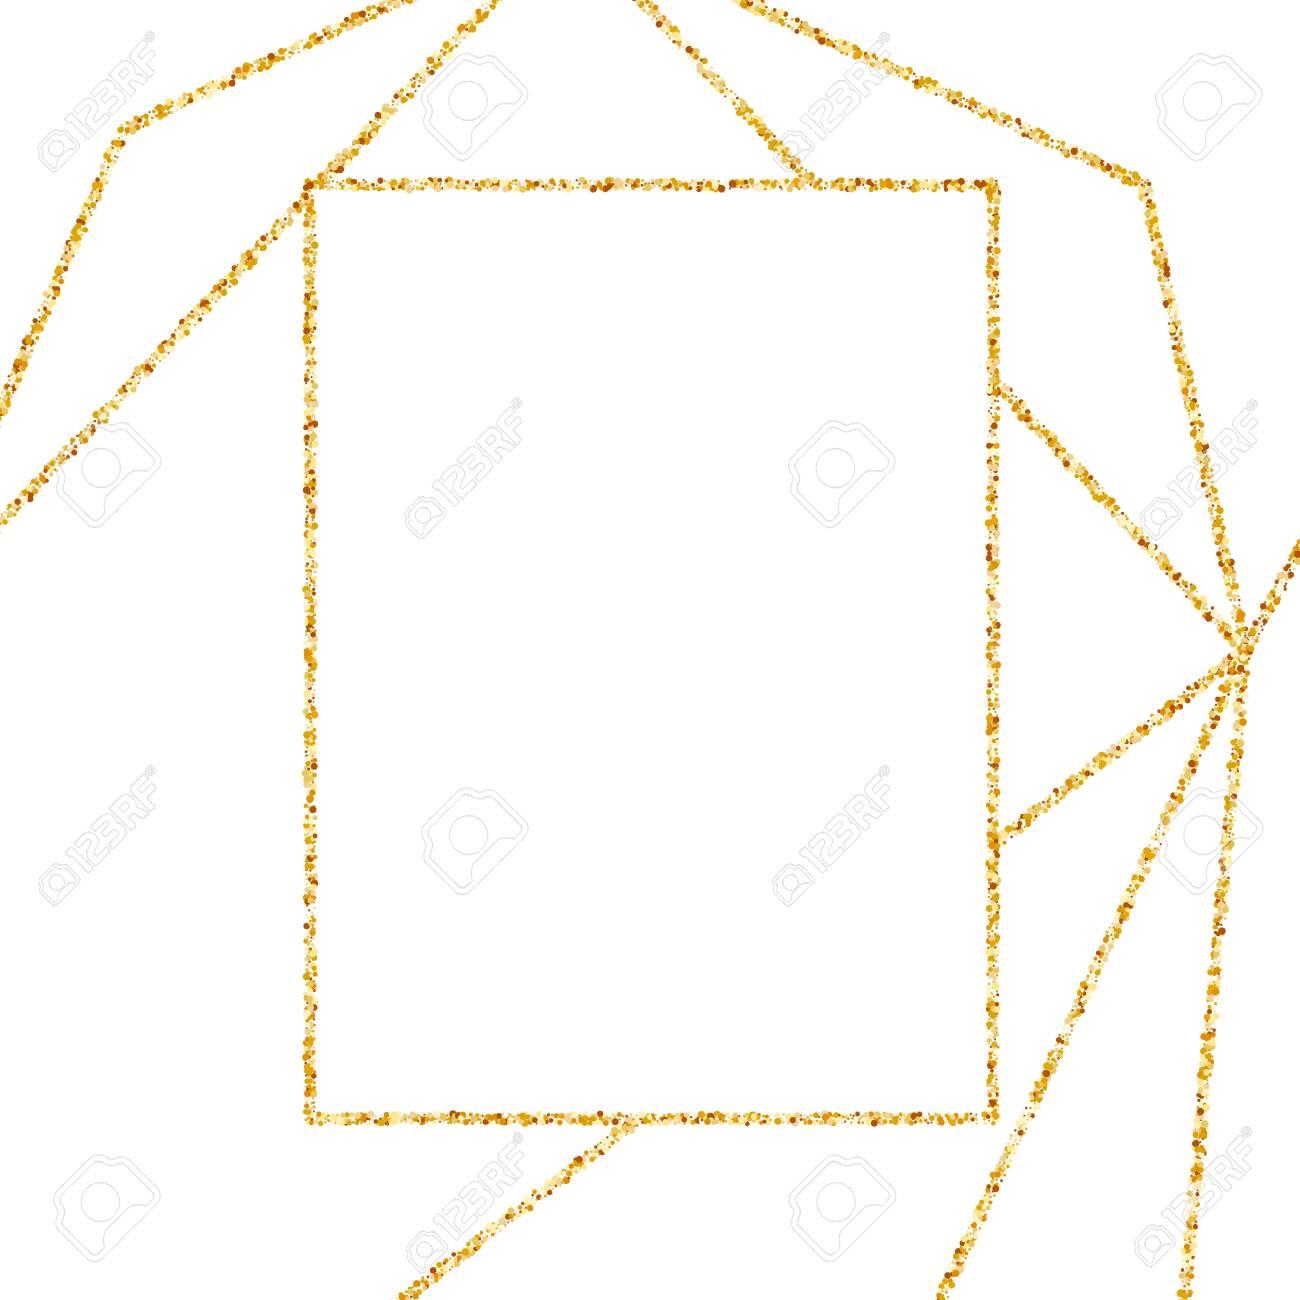 geometric gold frame for wedding or birthday invitation background